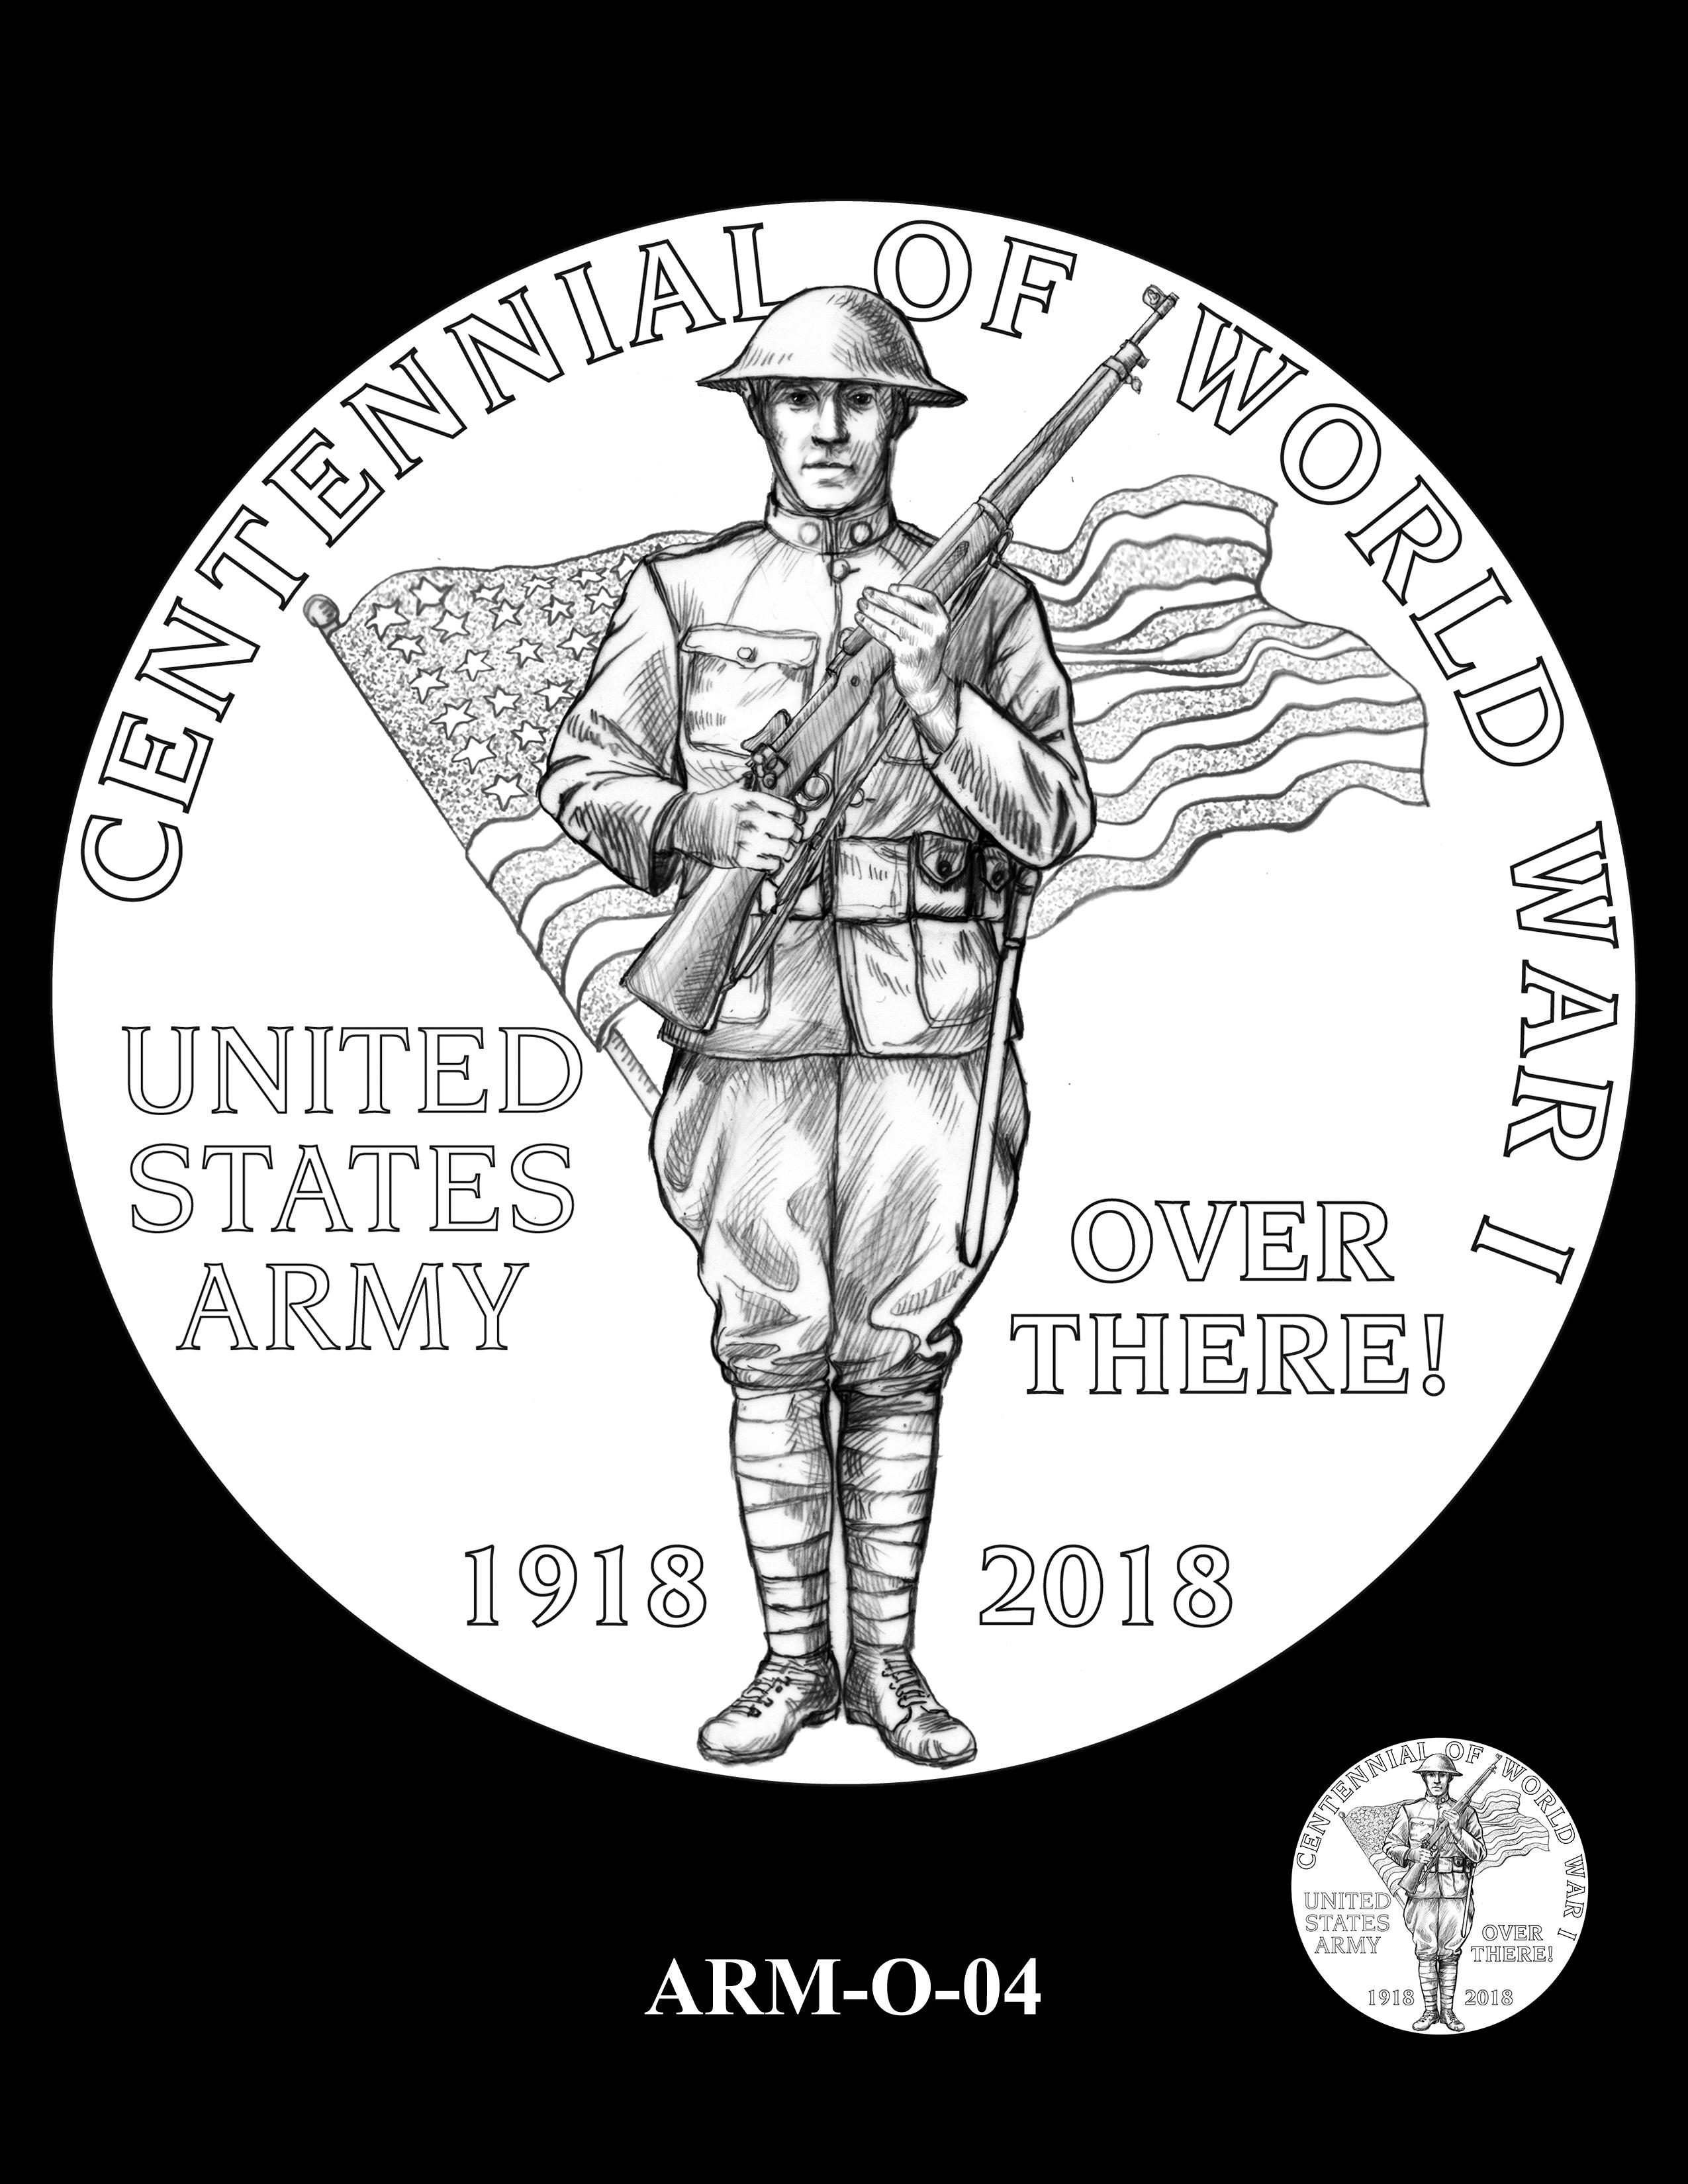 P1-ARM-O-04 -- 2018-World War I Silver Medals - Army